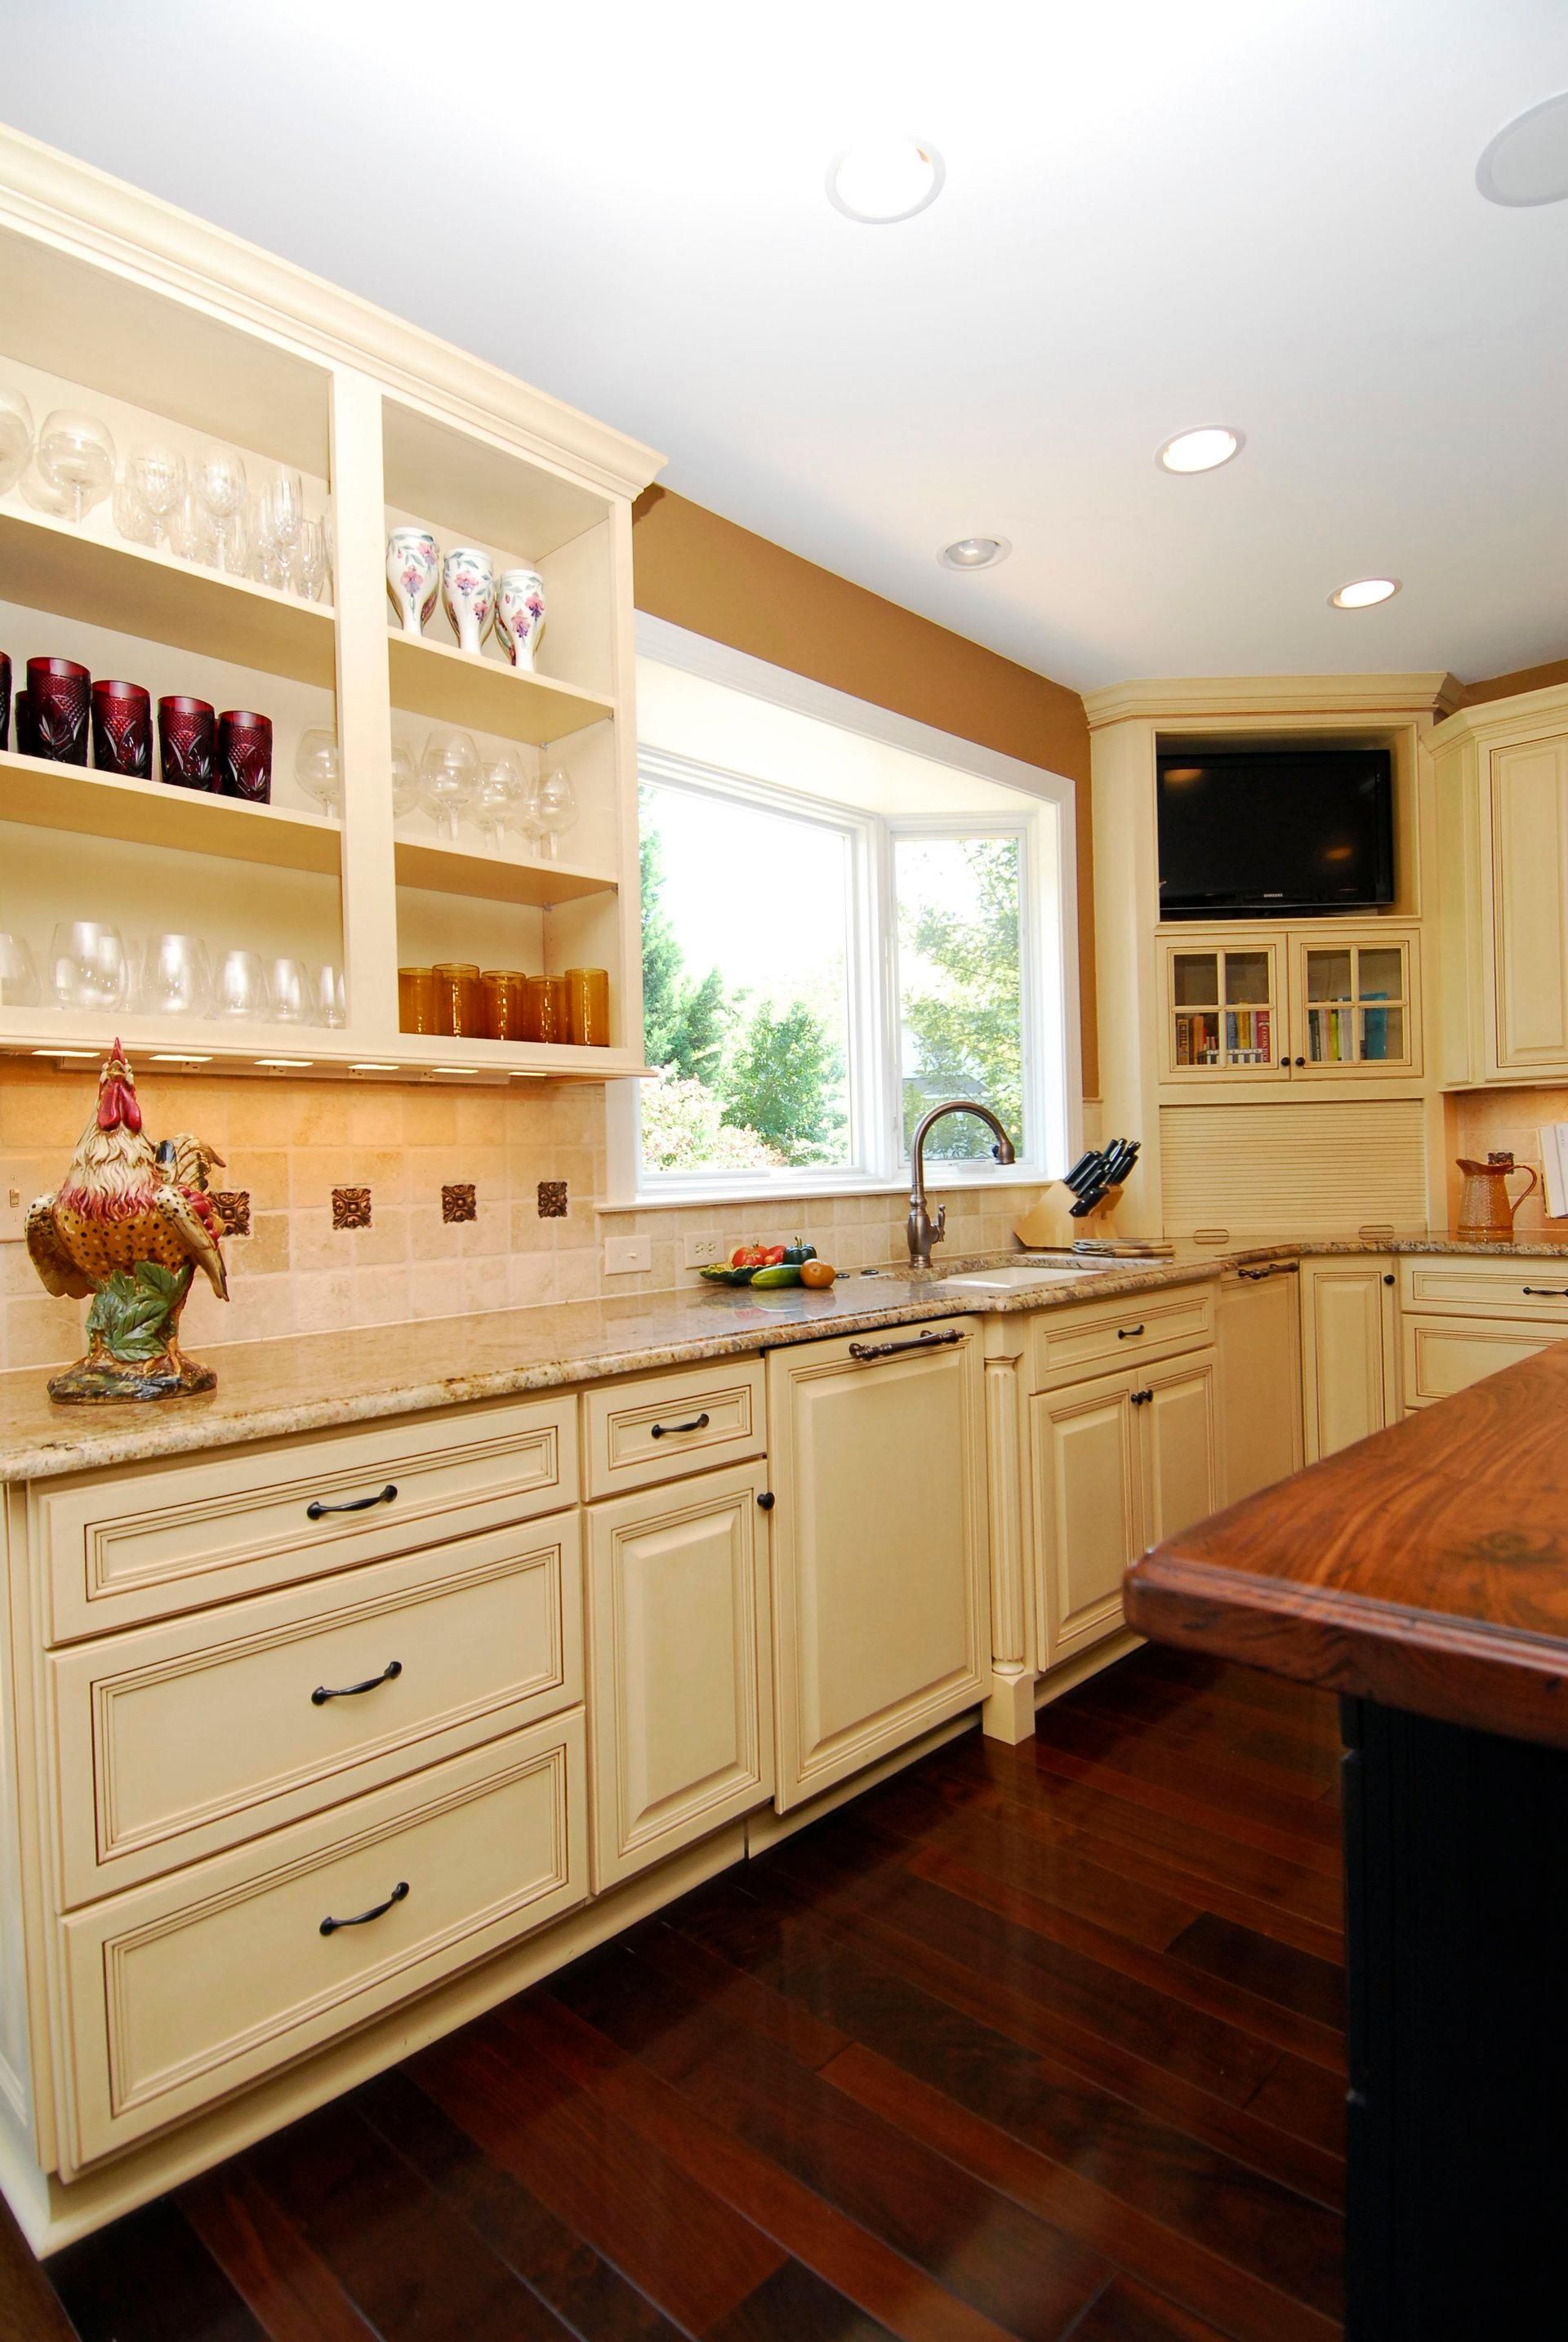 Terranova Construction Kitchen & Bath image 2